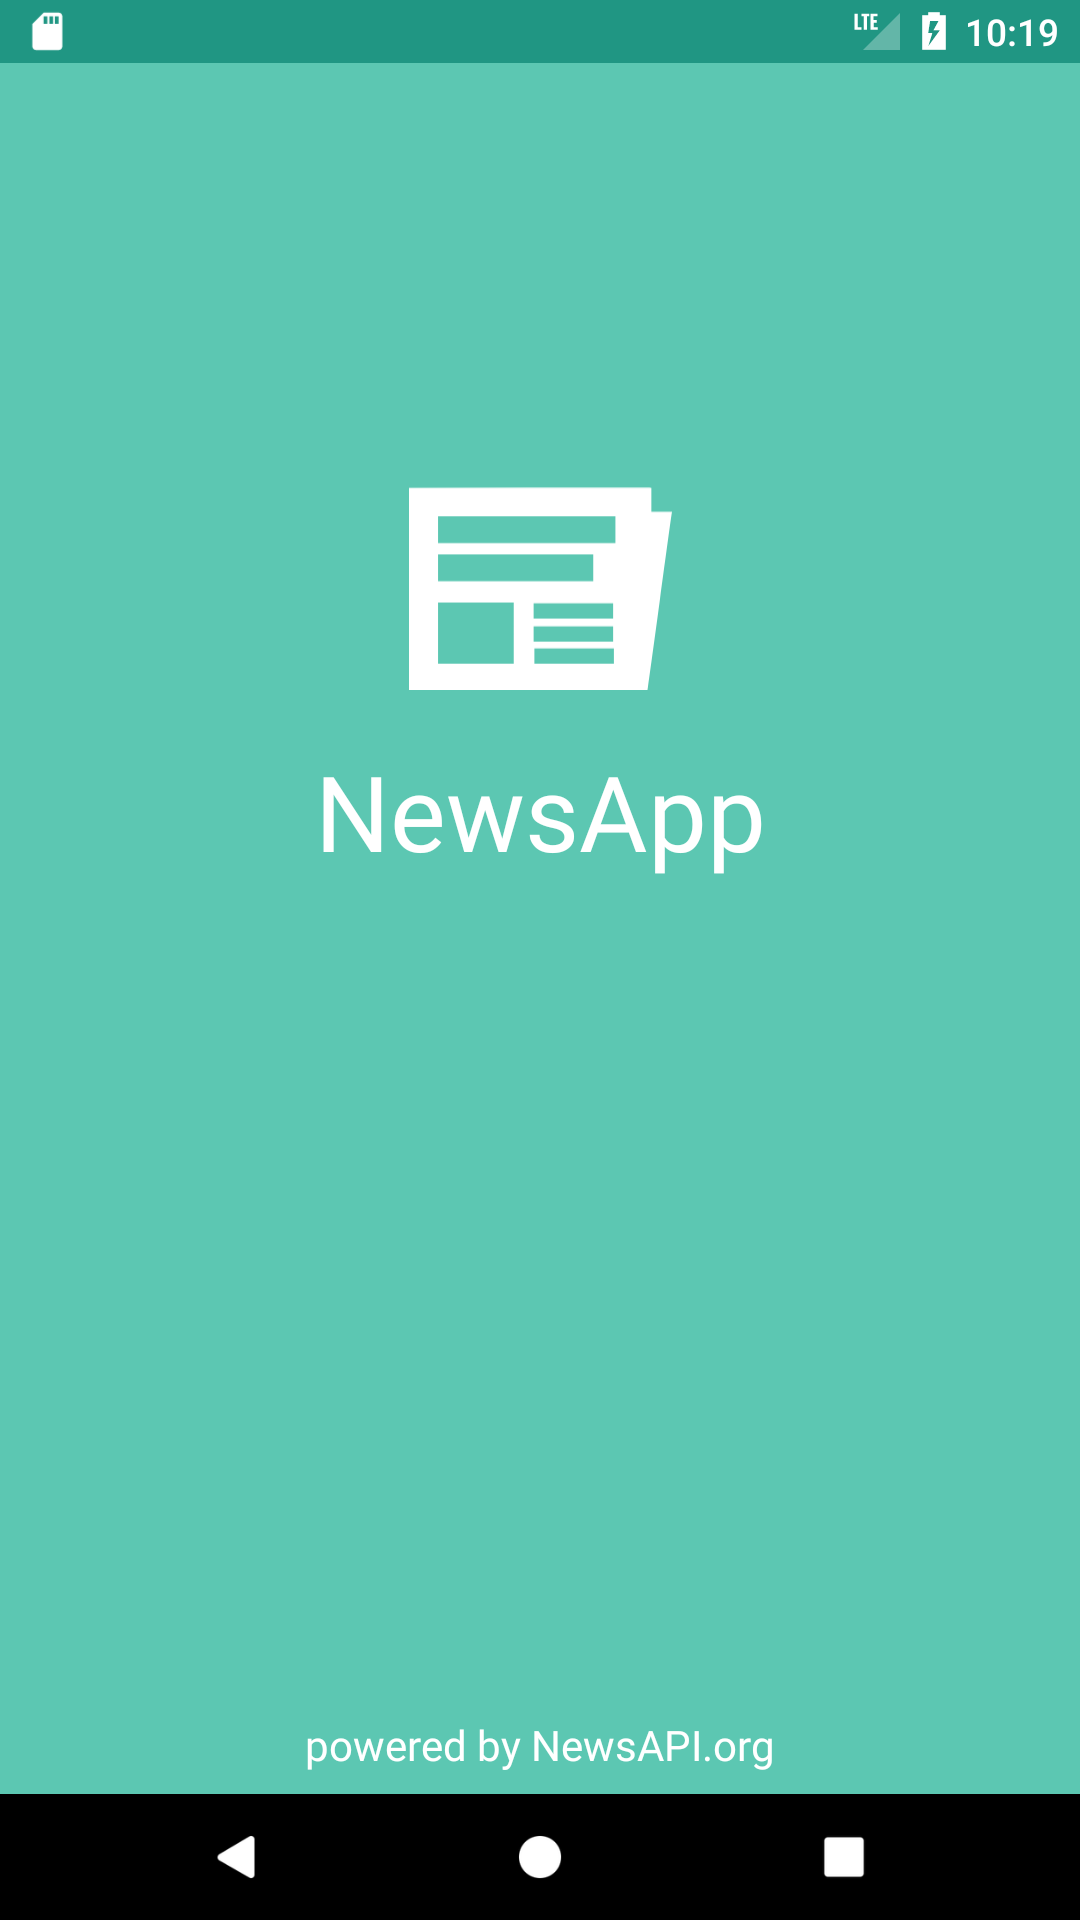 NewsApp Main Page